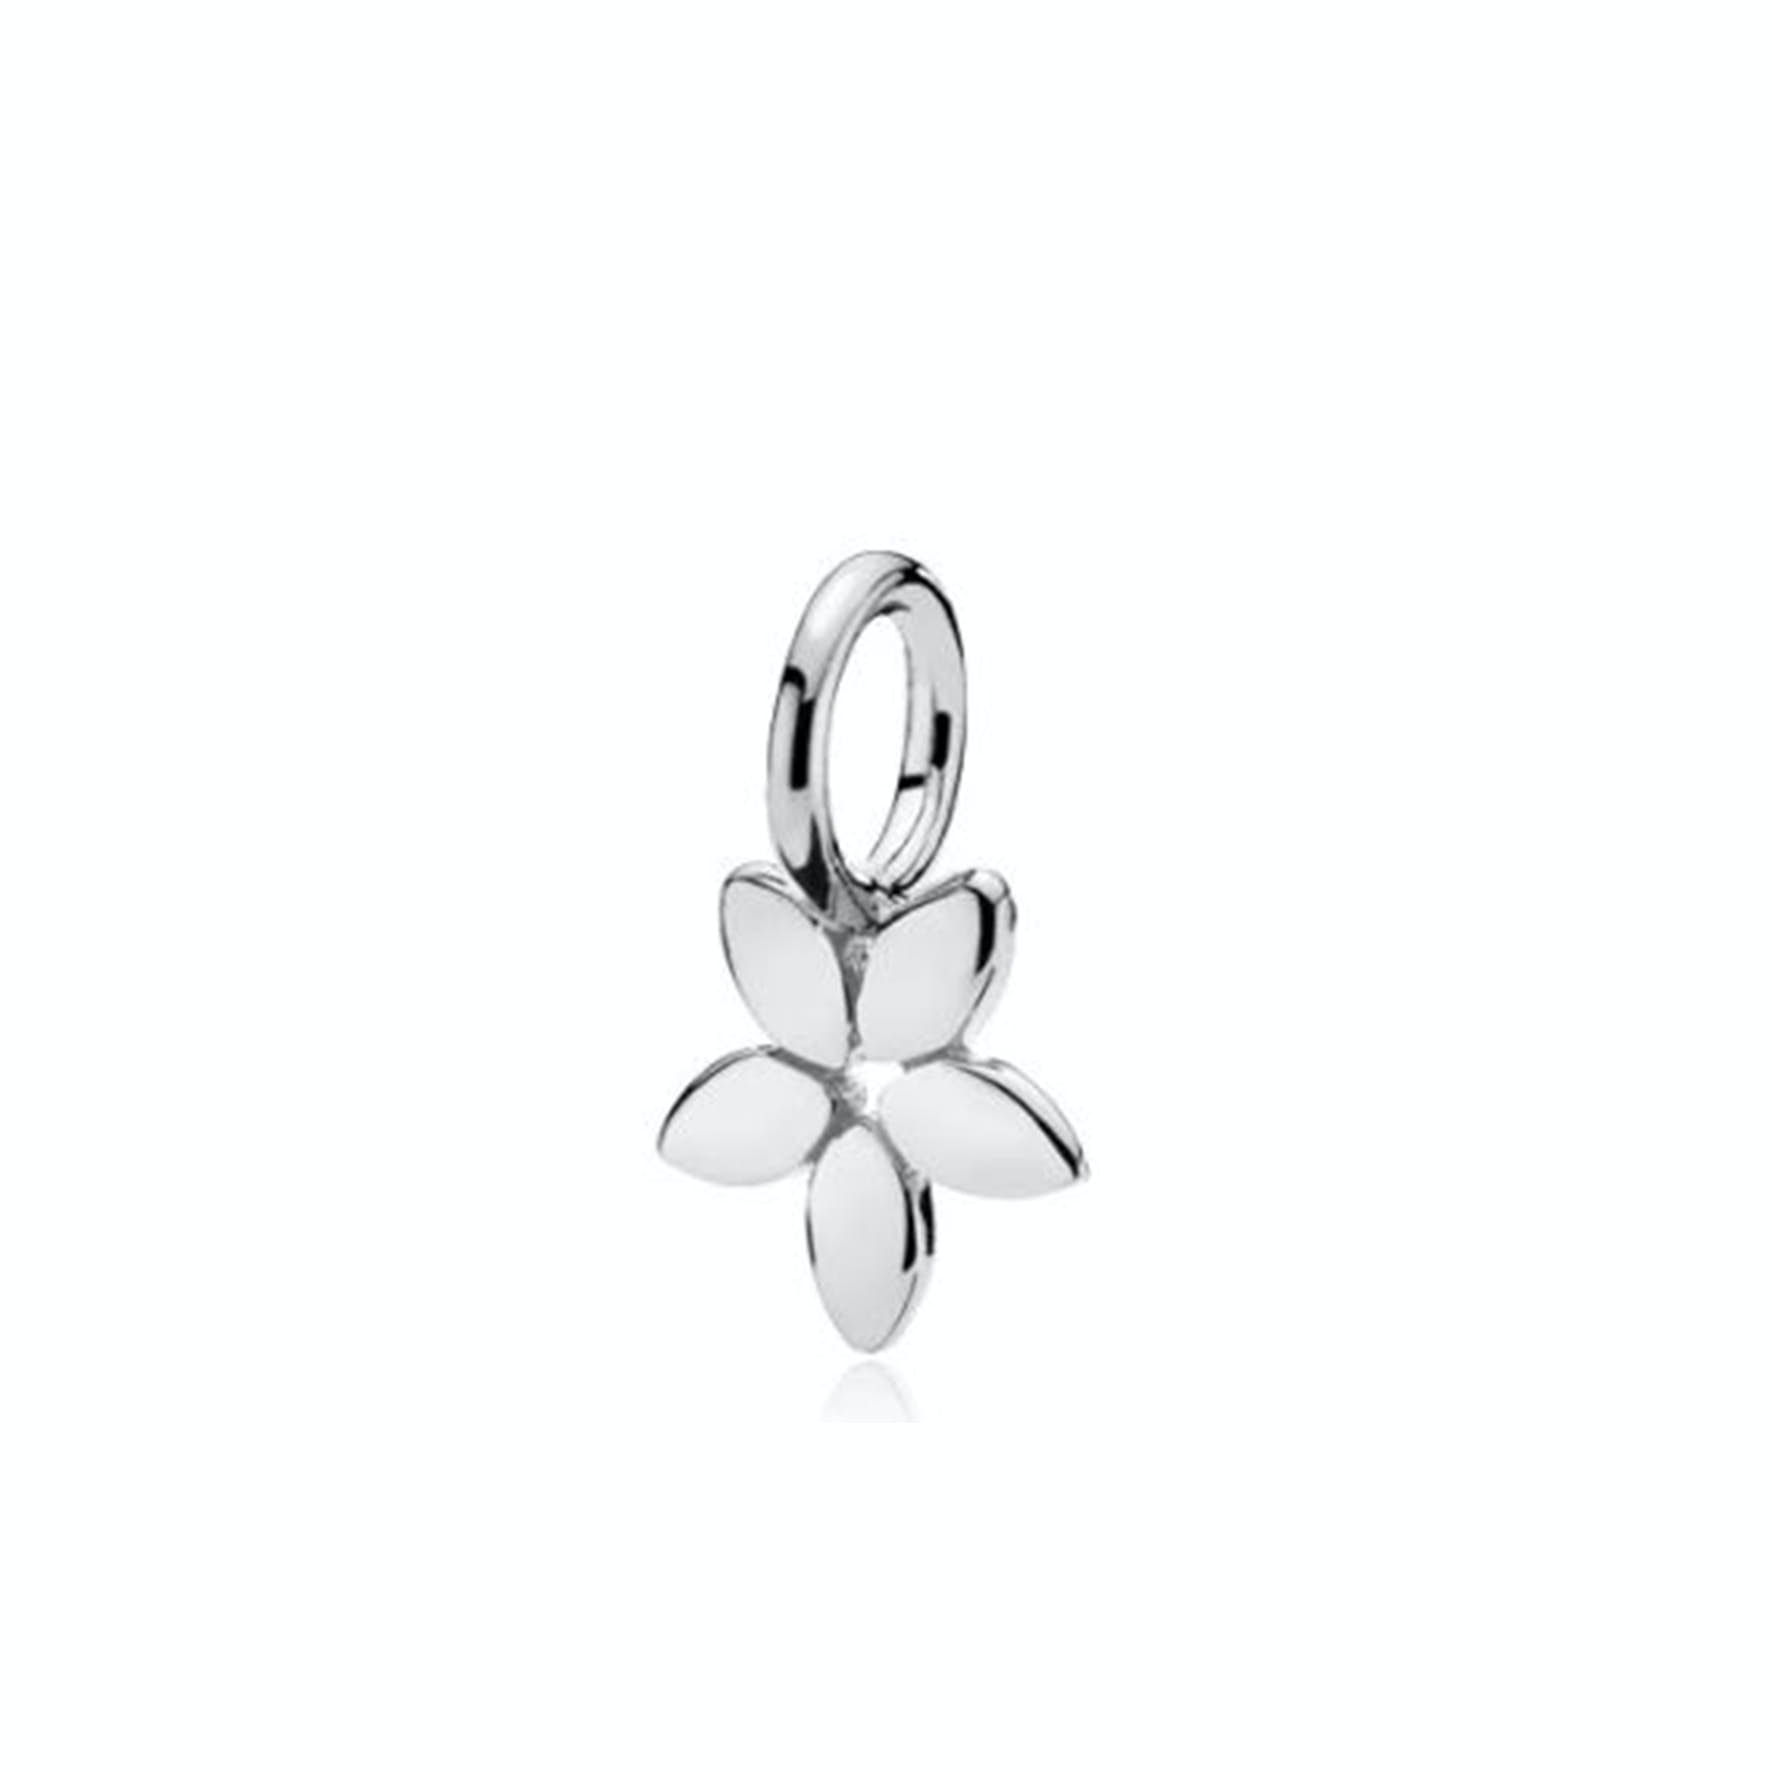 Magnolia pendant från Izabel Camille i Silver Sterling 925